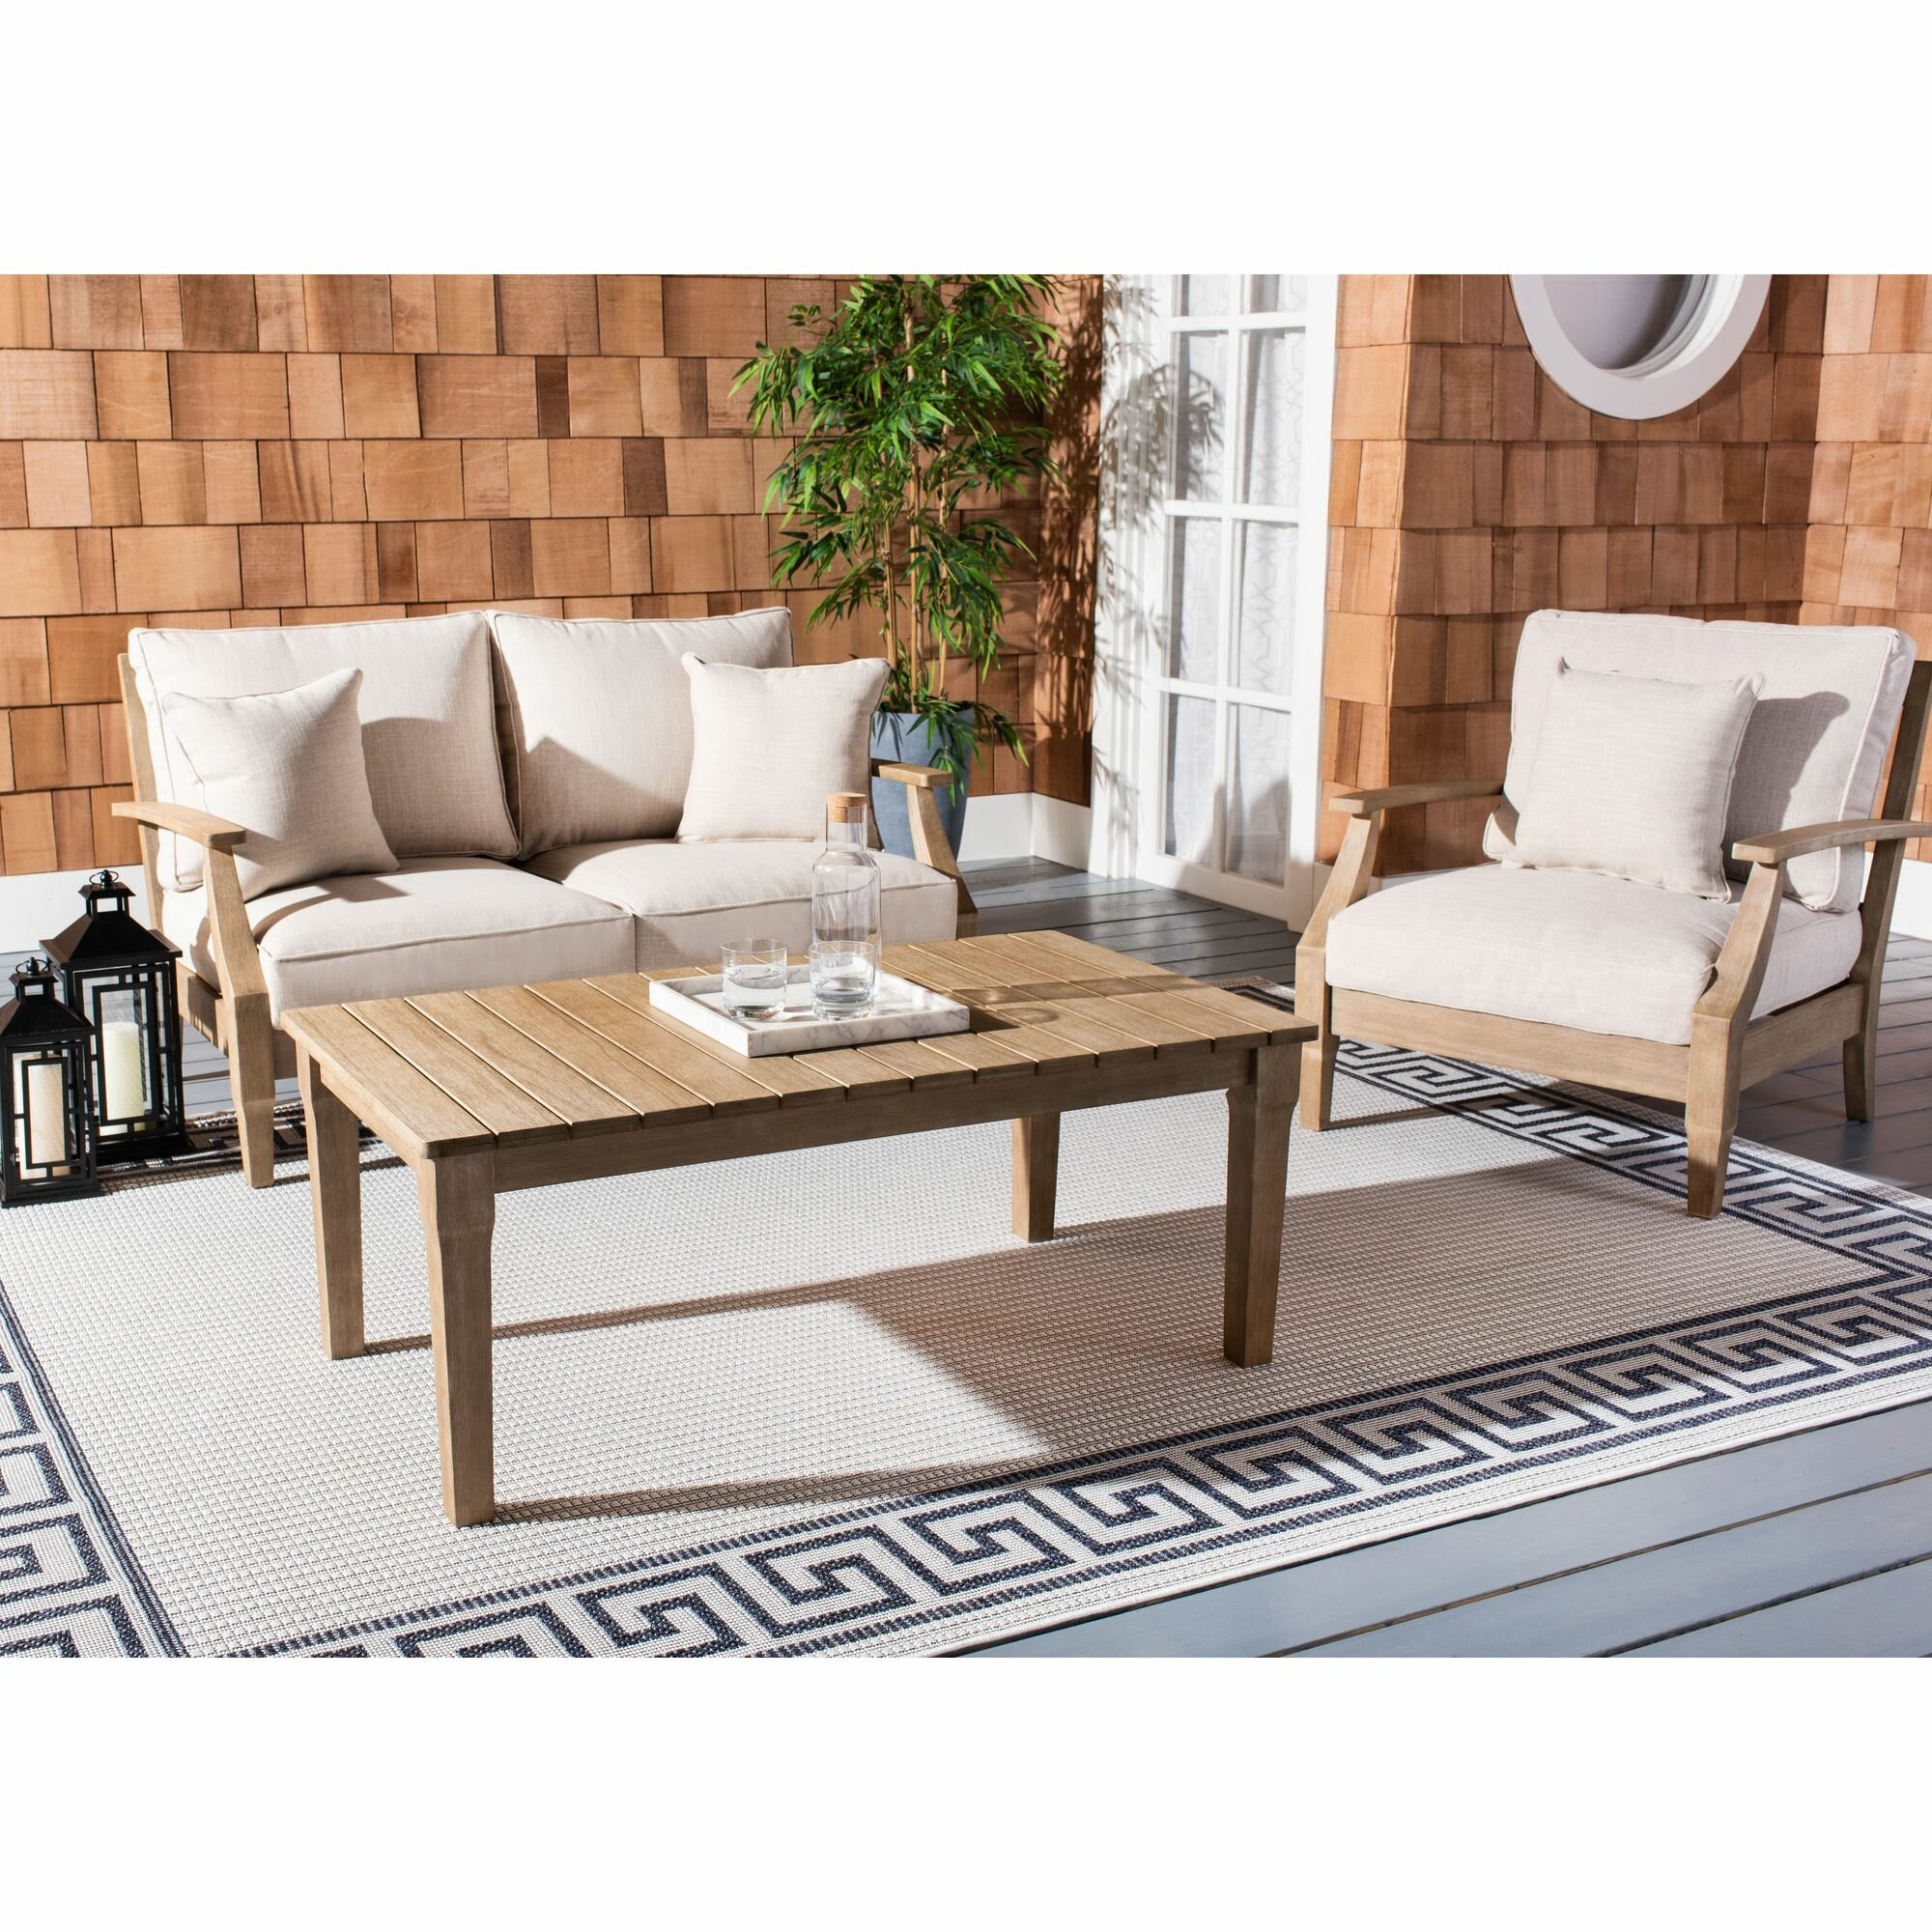 Highland Dunes Ducan Wooden Coffee Table Reviews Wayfair